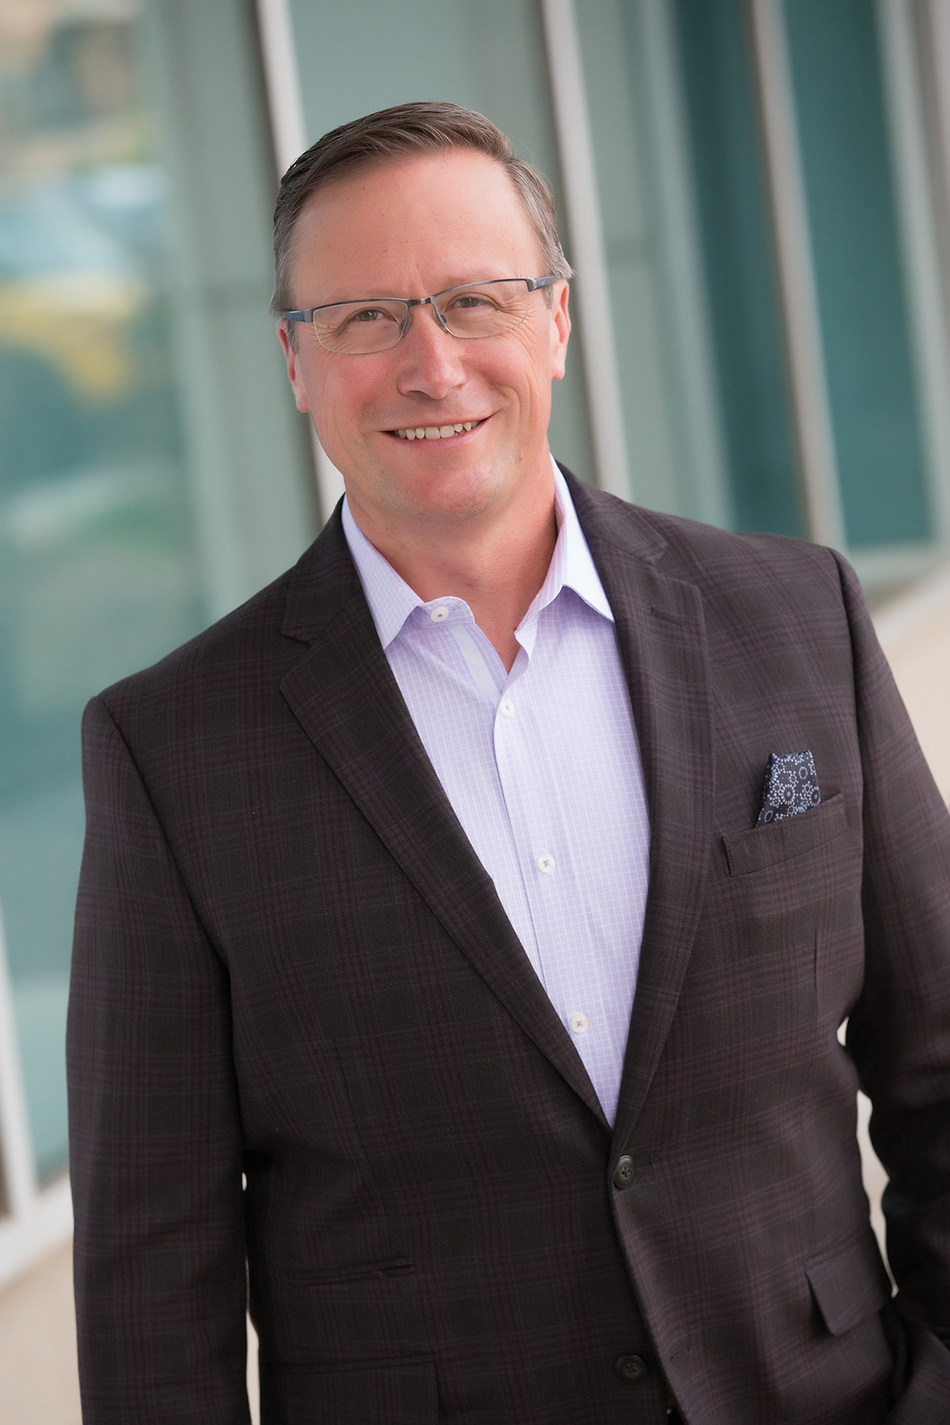 Eric Rupe named President of Lerch Bates Inc.